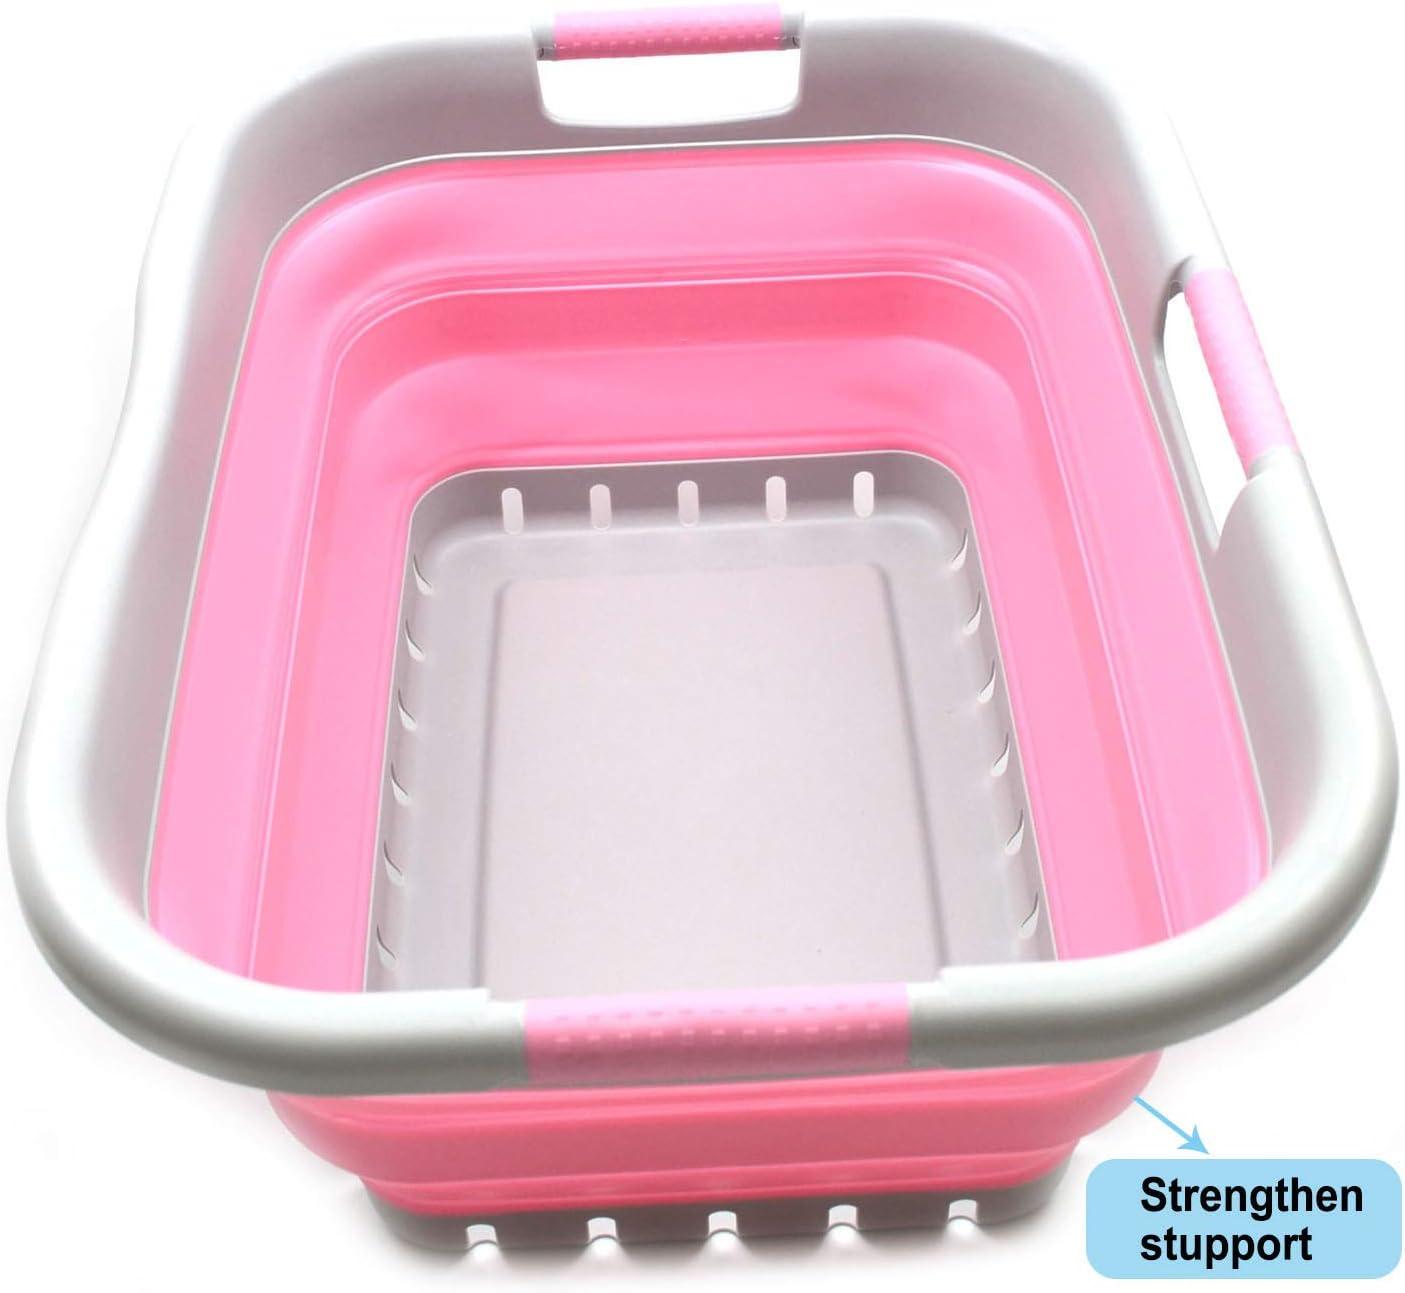 SAMMART Collapsible 3 Handled Plastic Laundry Basket - Foldable Pop Up Storage Container/Organizer - Portable Washing Tub - Space Saving Hamper/Basket (3 Handled Rectangular, Grey/Pink)